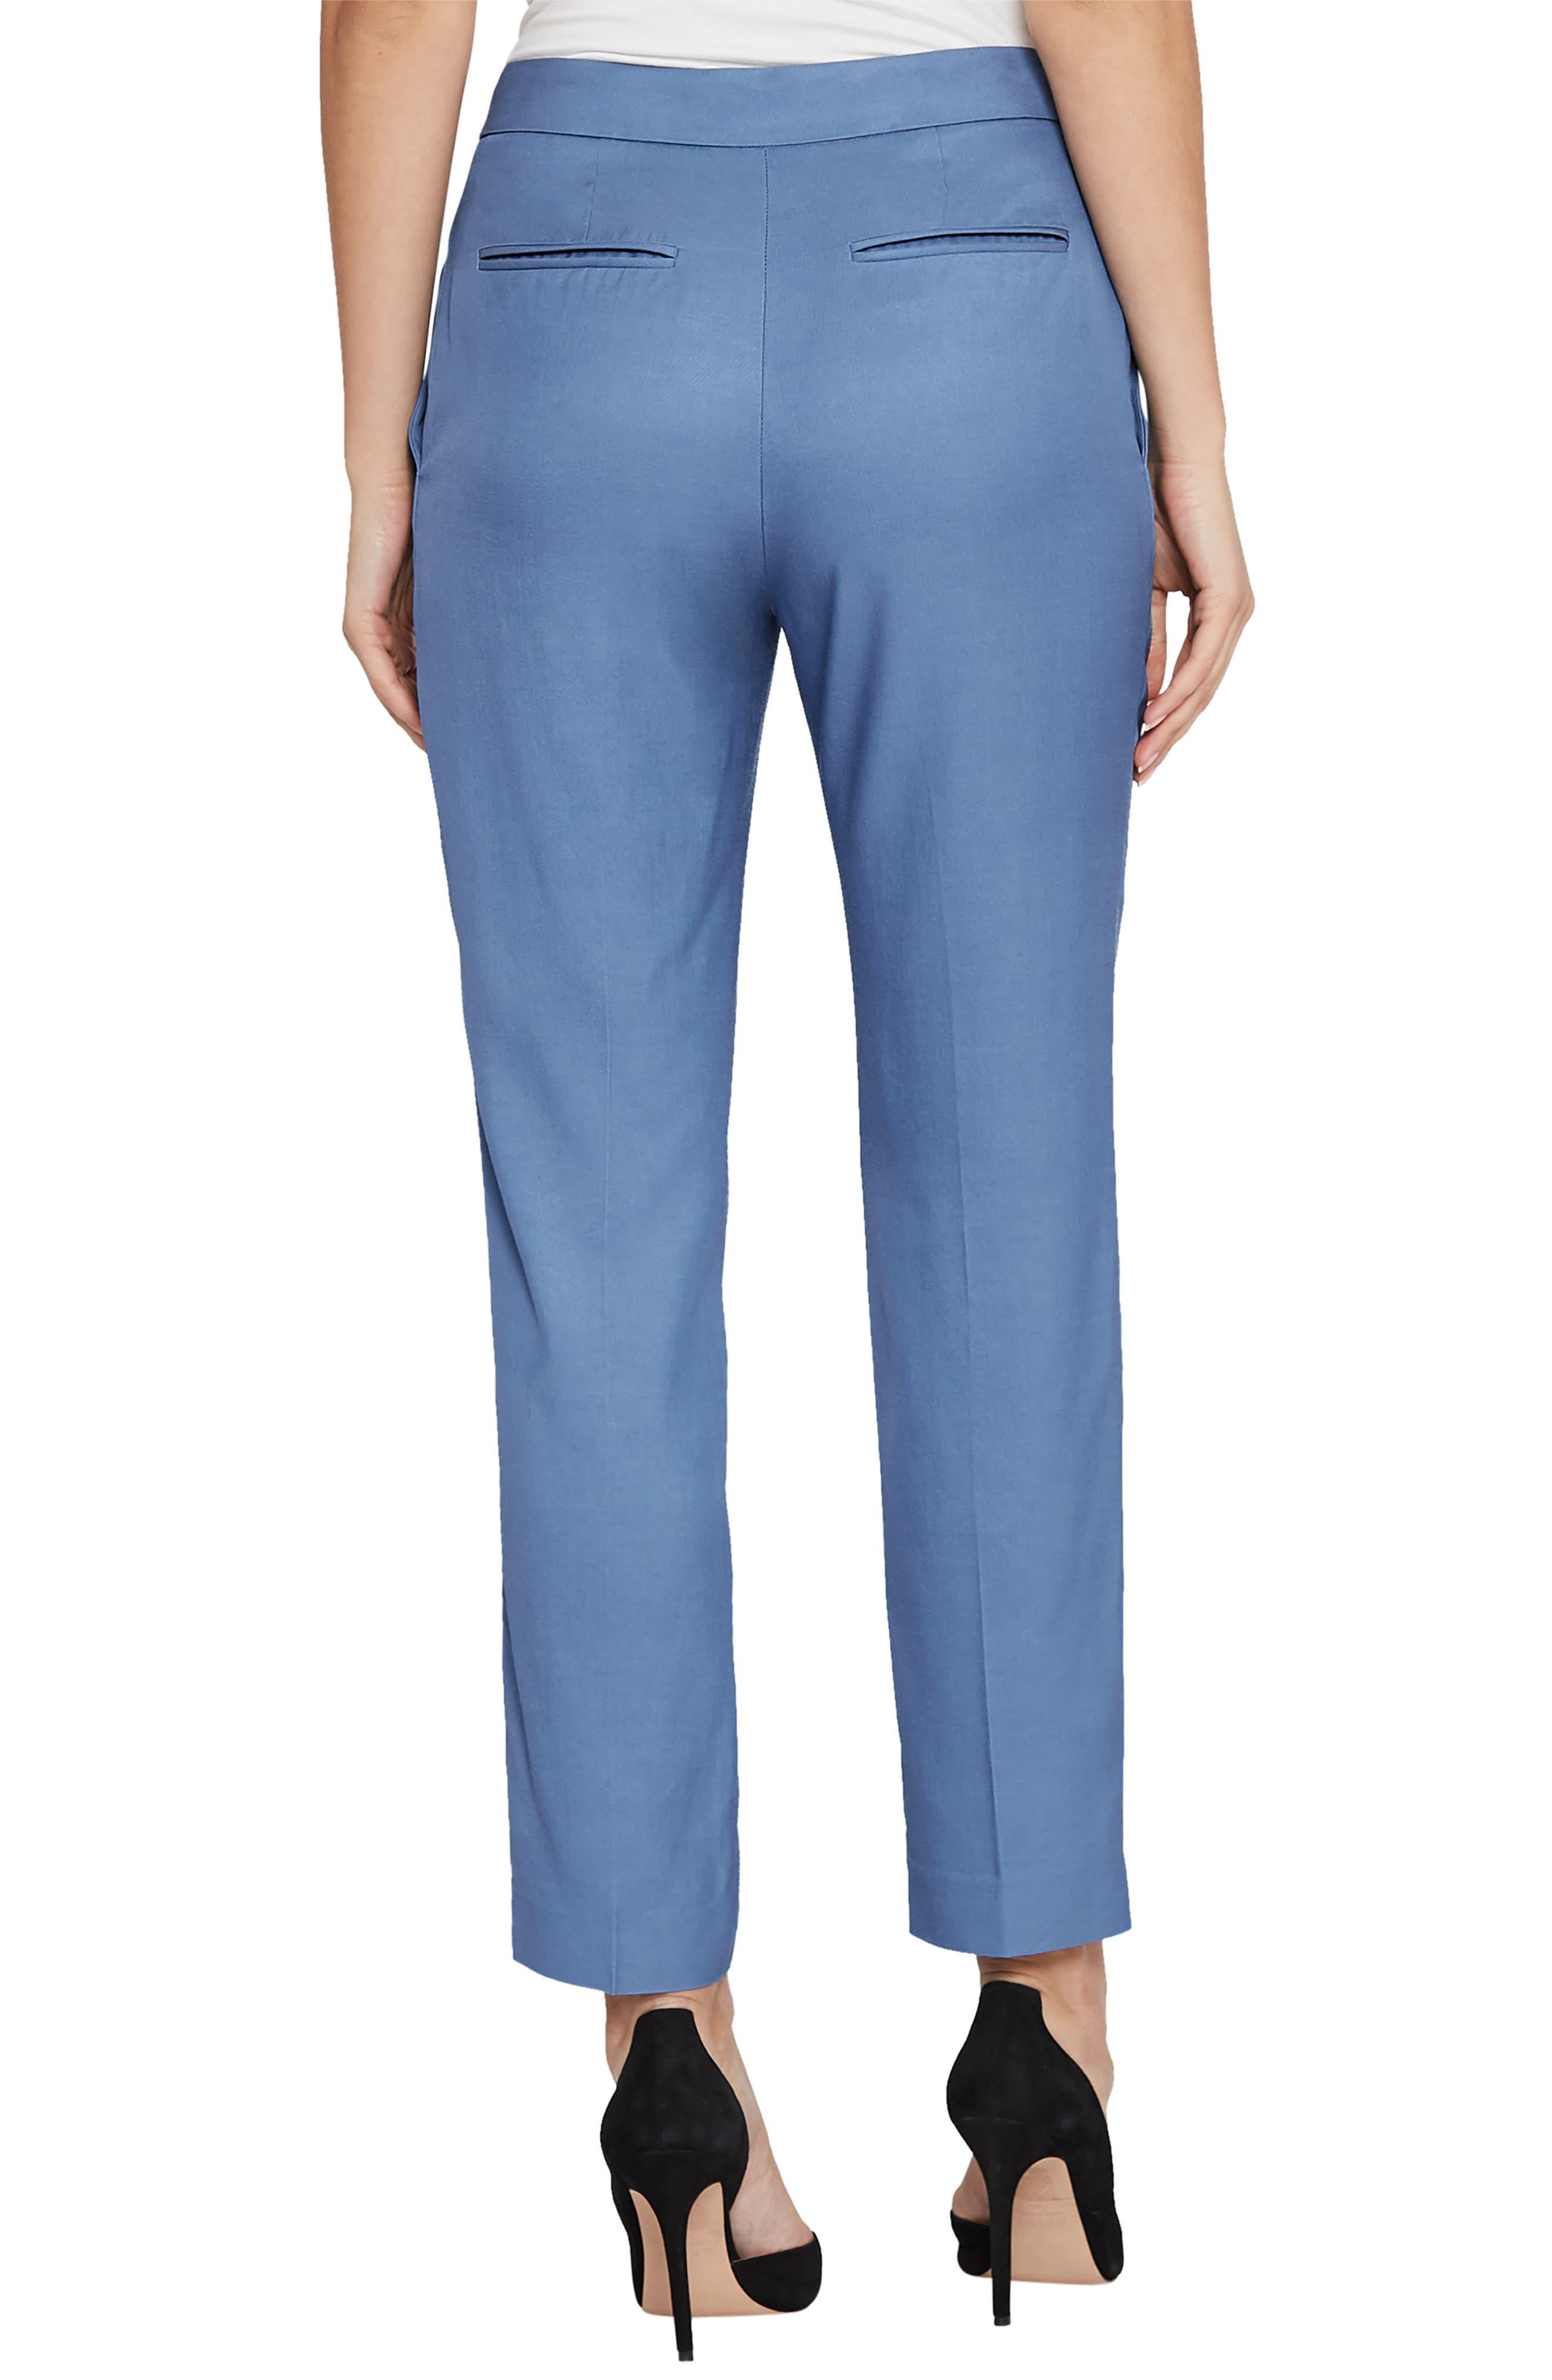 Etta Wool Blend Trousers,                             Alternate thumbnail 2, color,                             410